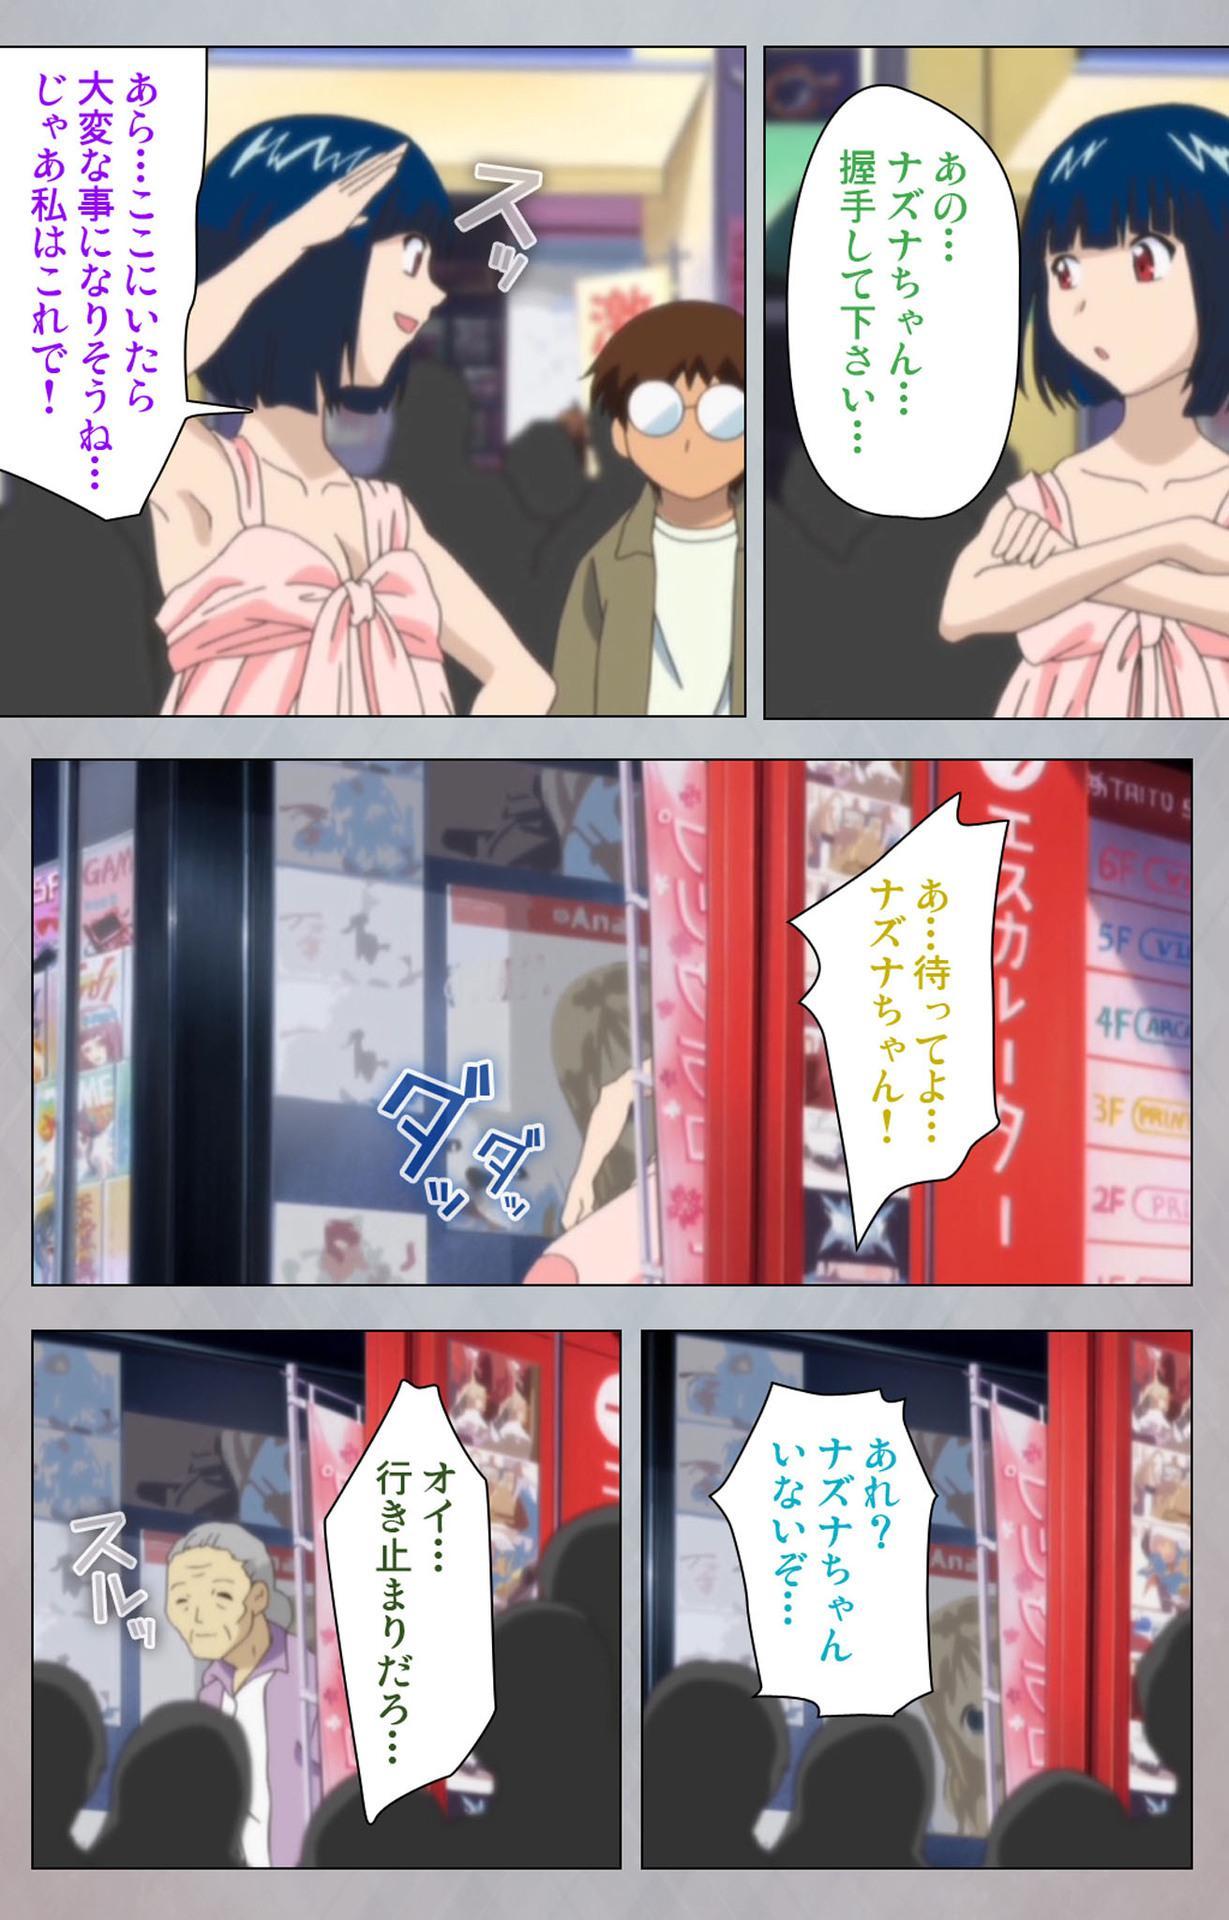 [Digital Works] [Full Color Seijin Ban] Sex Android ~Risou no Onna de Nuite yaru~ Kanzenban 187